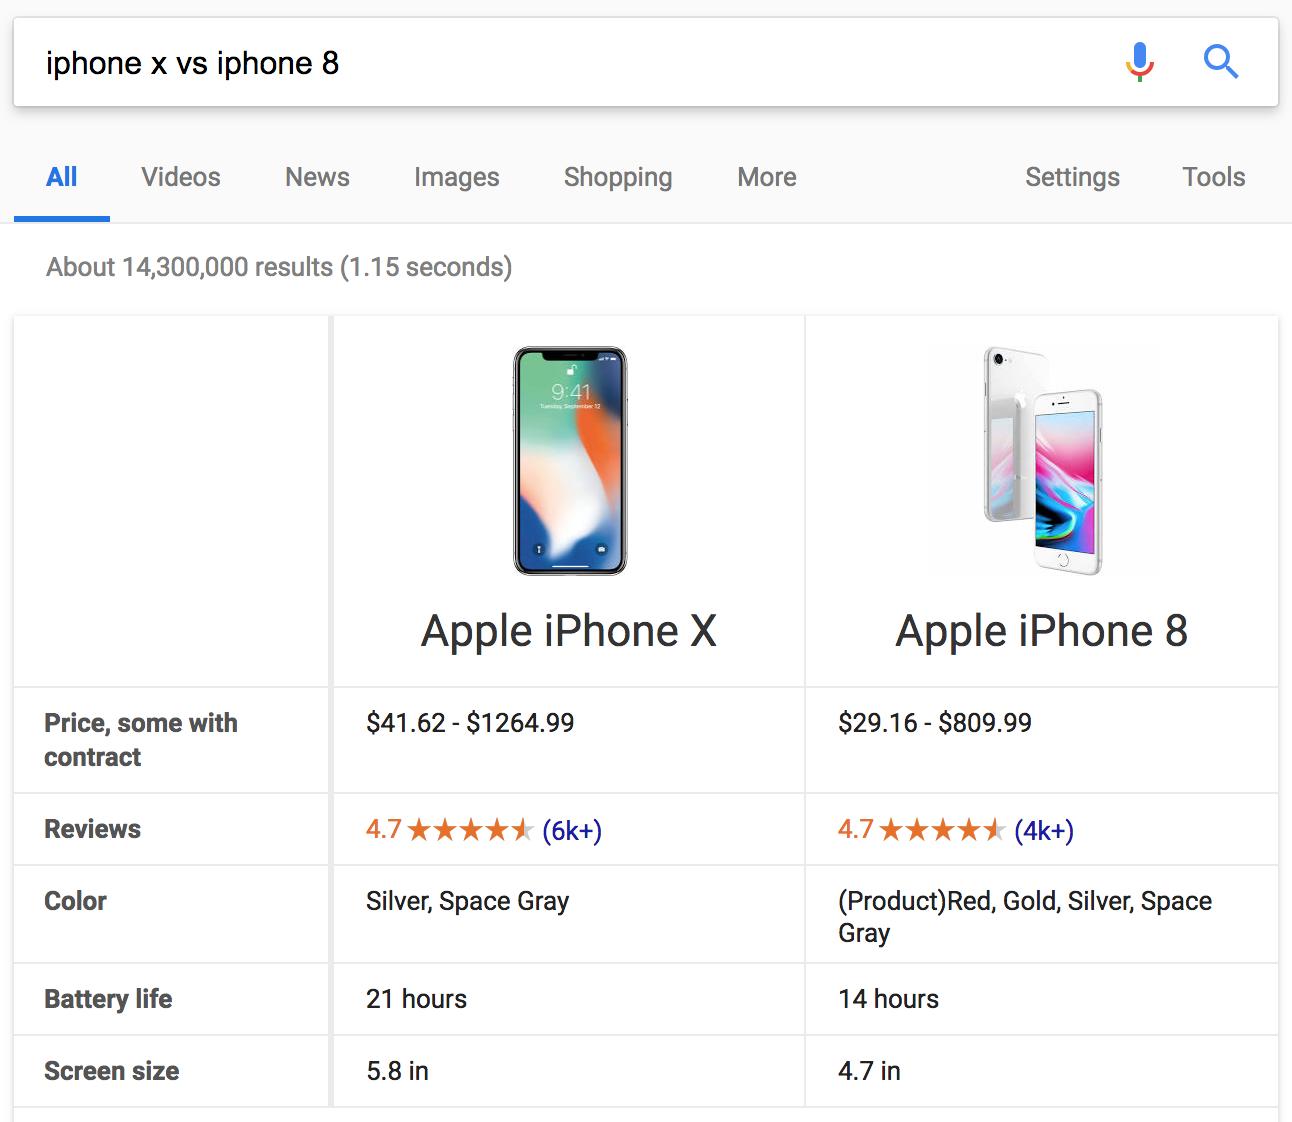 iPhone X vs iPhone 8